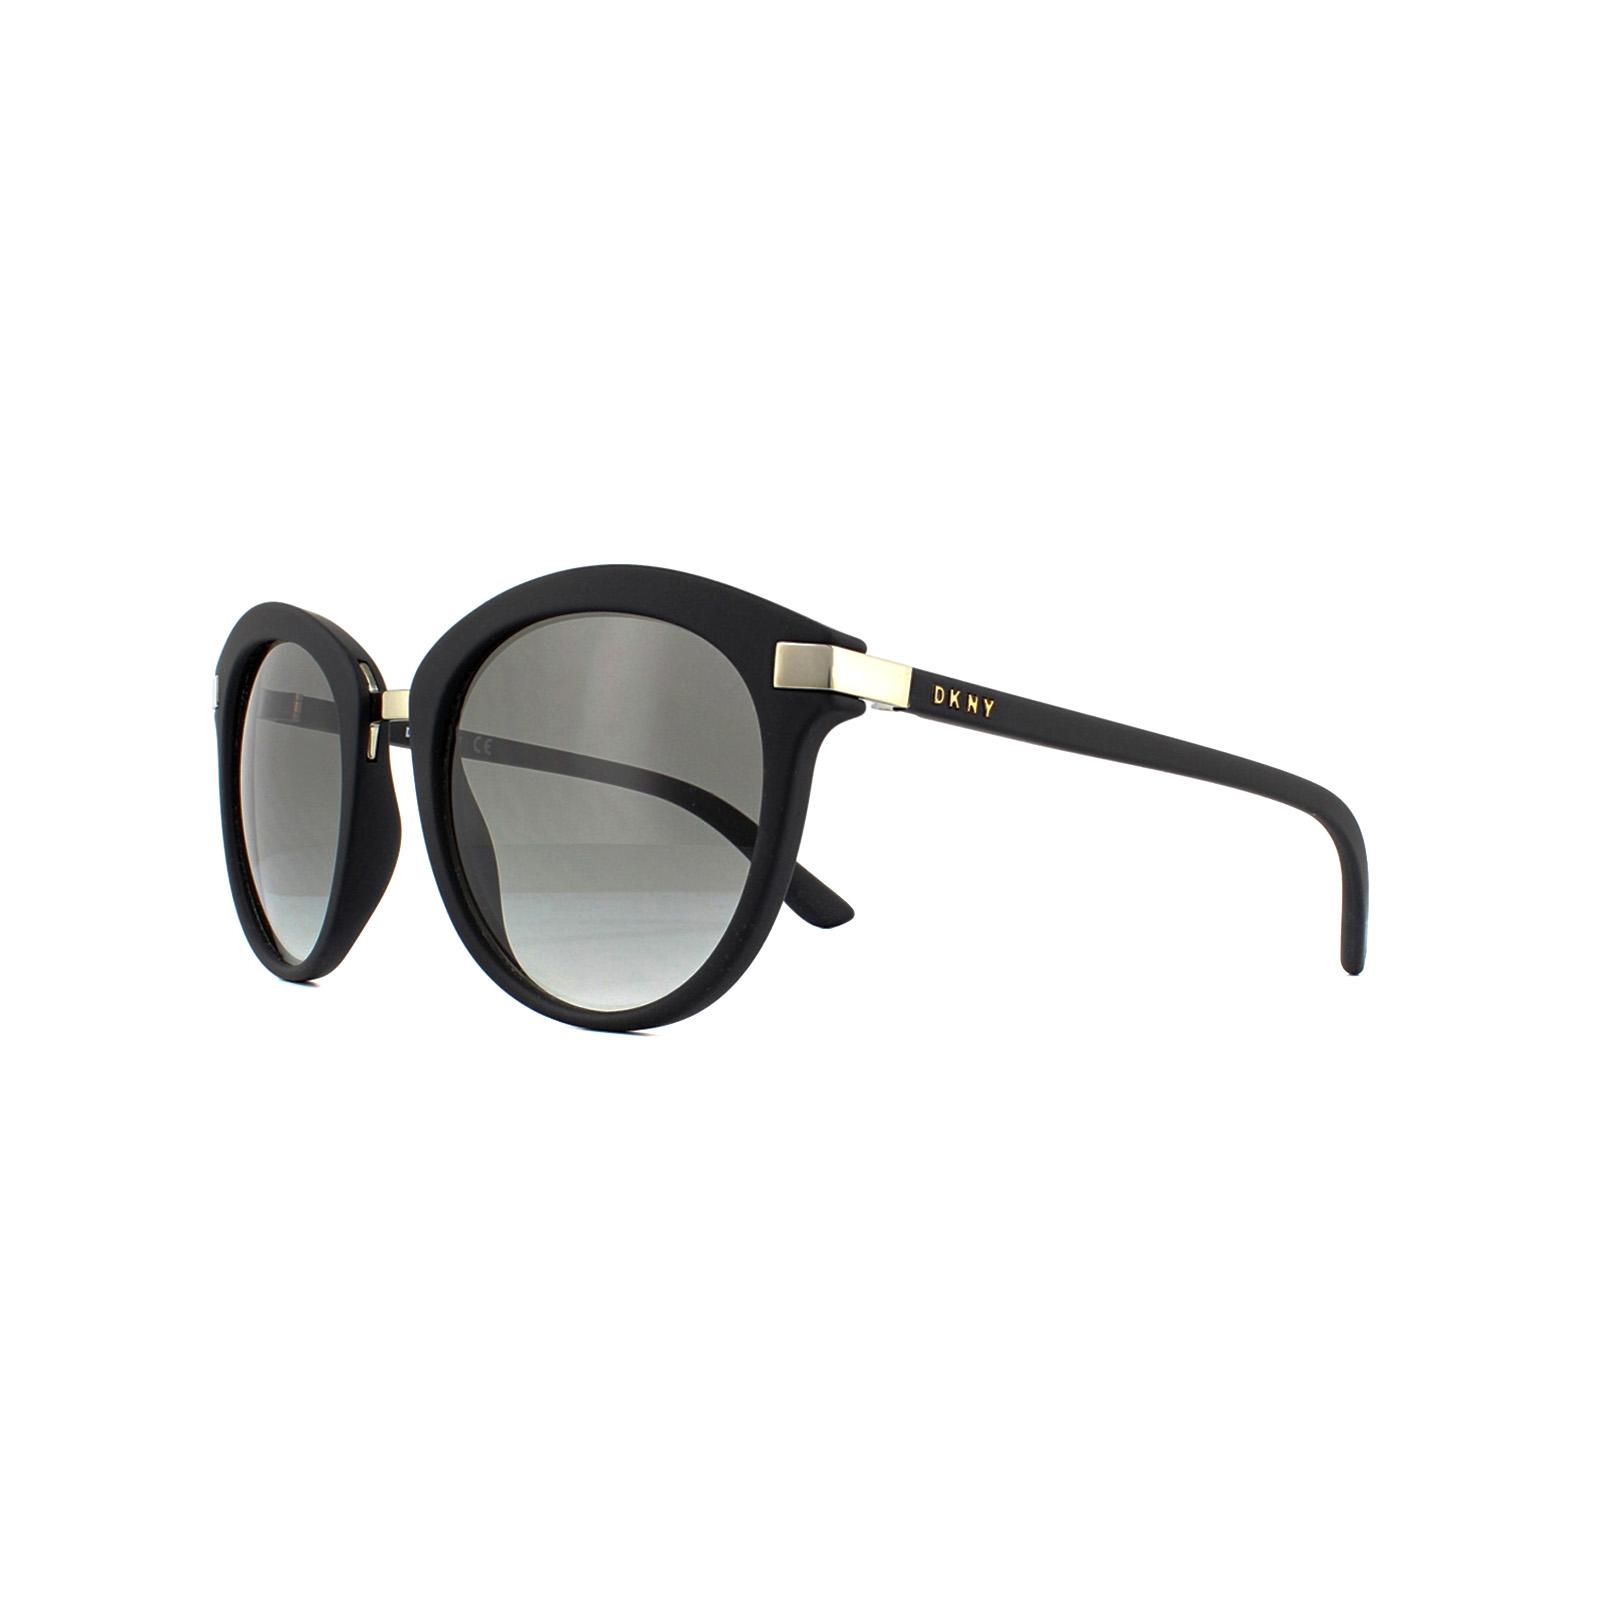 cdd532f9de70 Cheap DKNY 4140 Sunglasses - Discounted Sunglasses